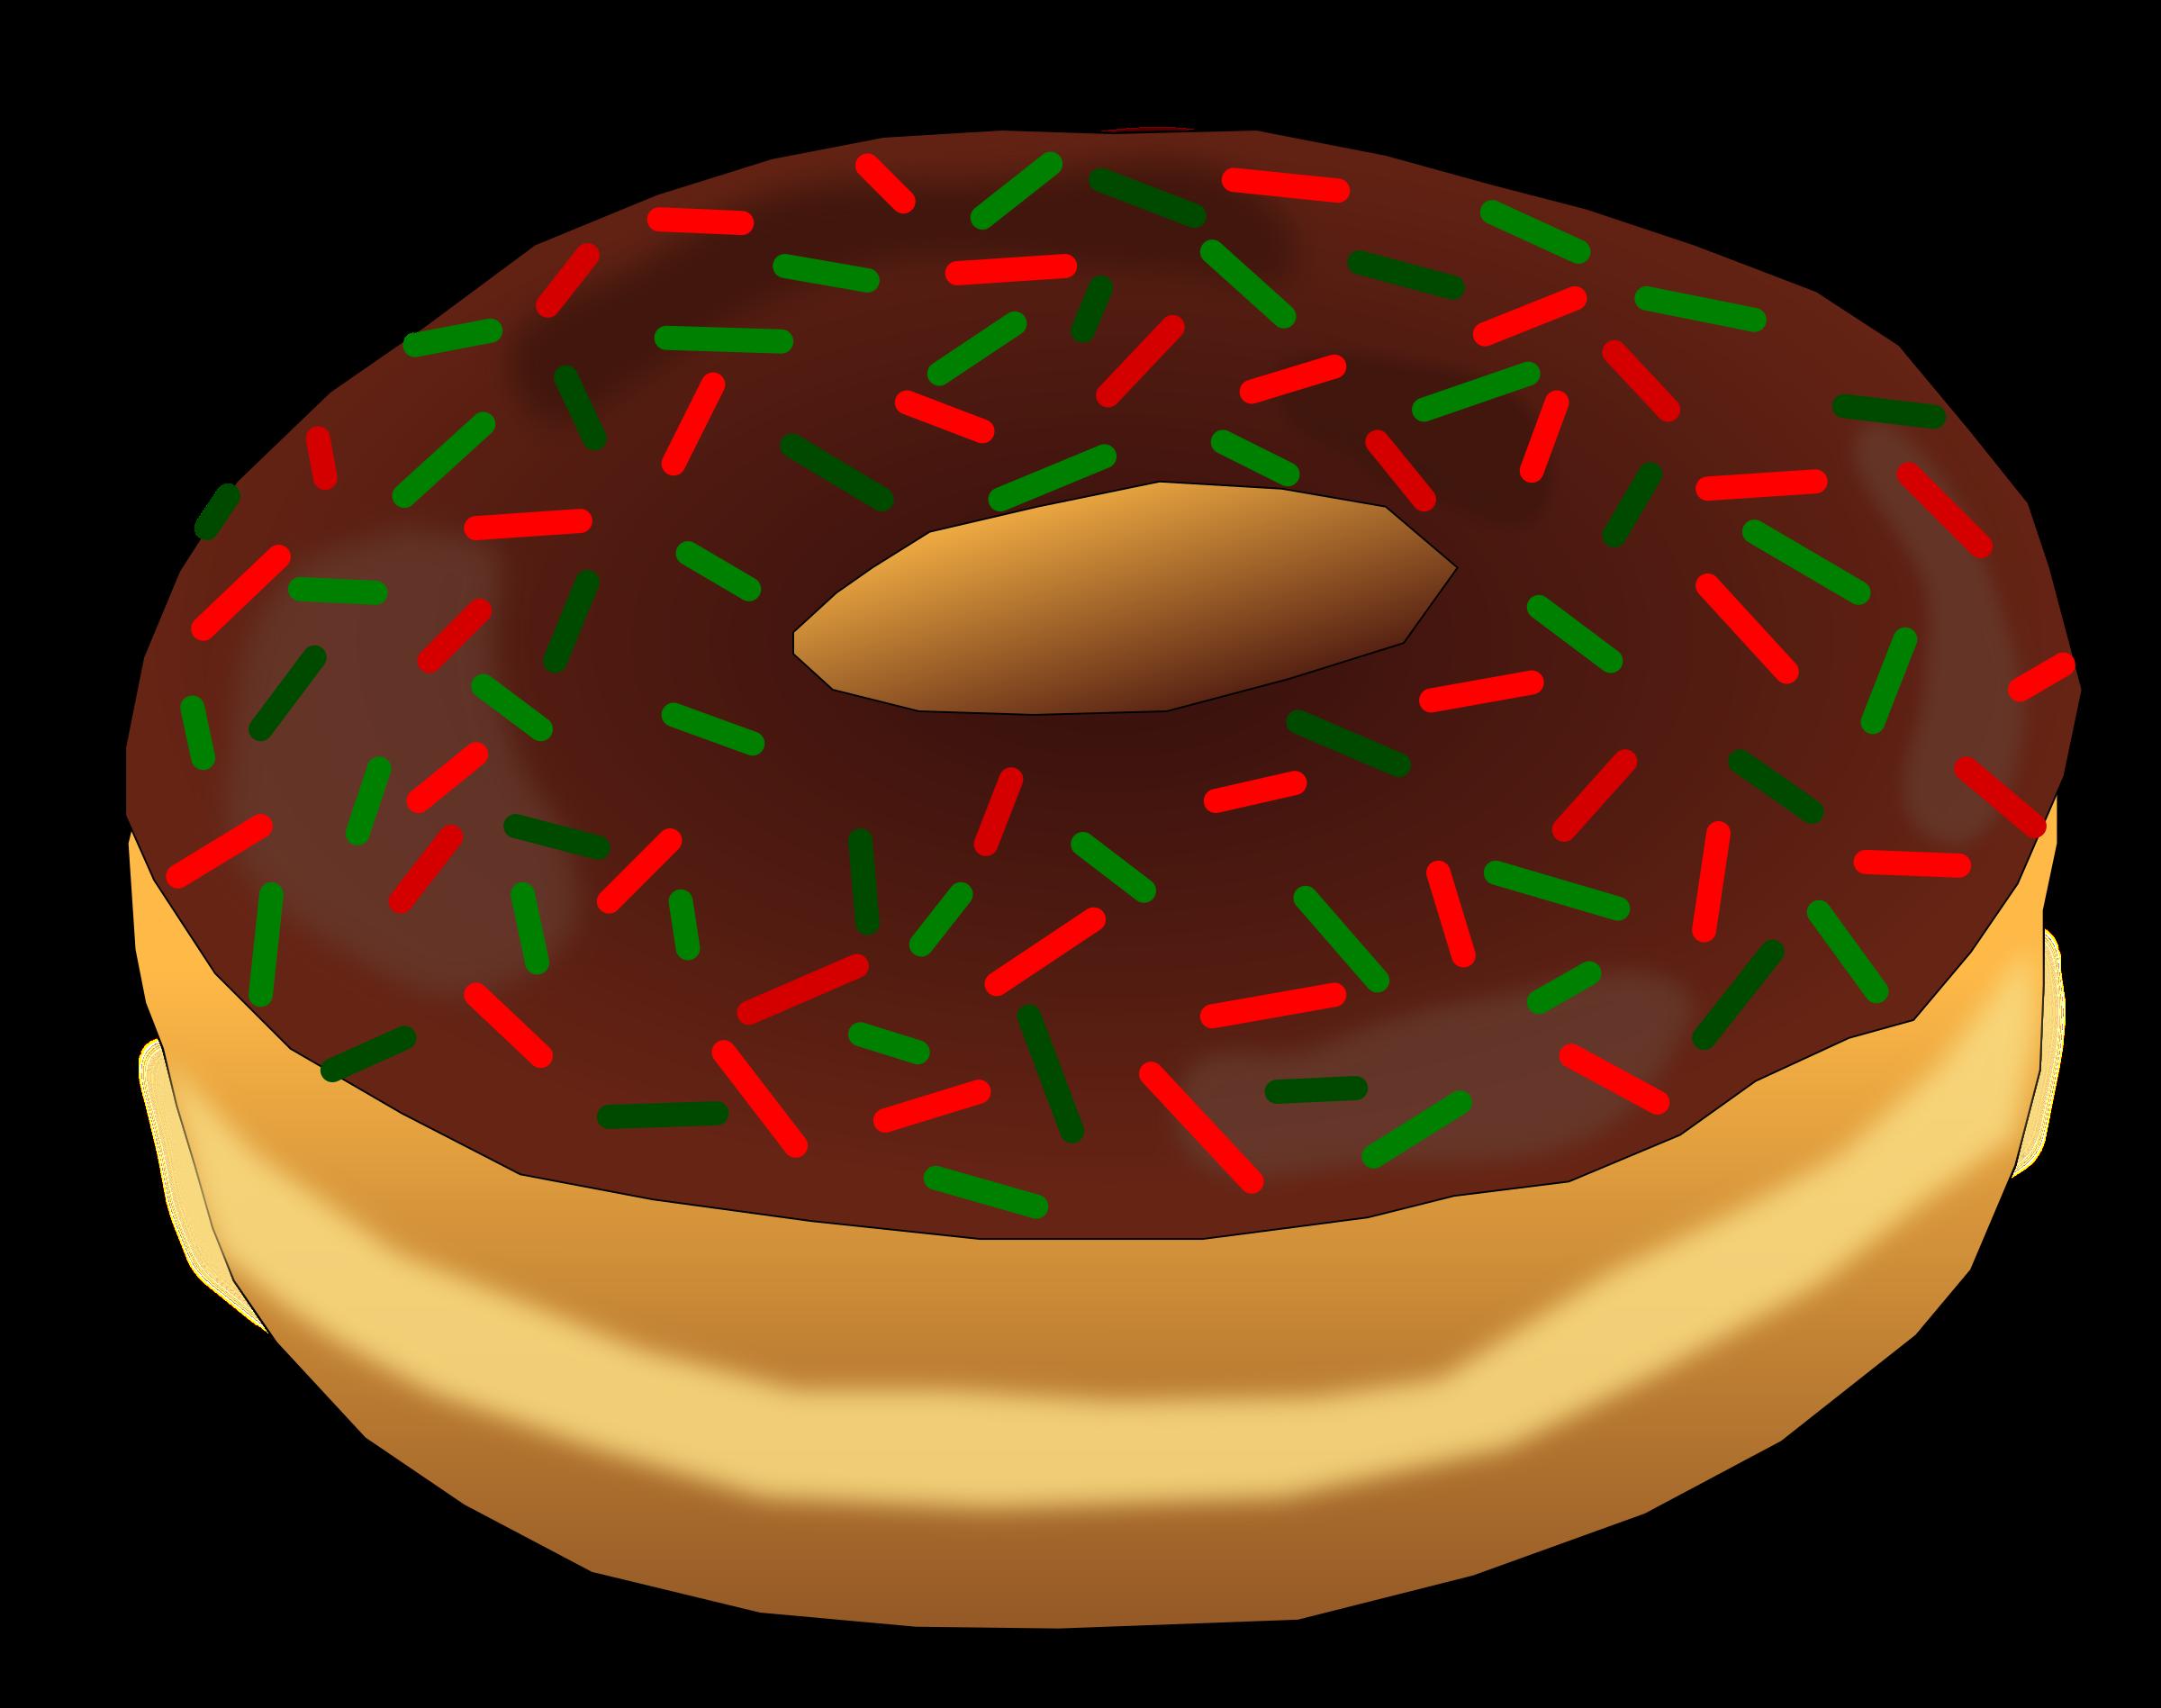 Doughnut clipart pastel. Christmas donut big image